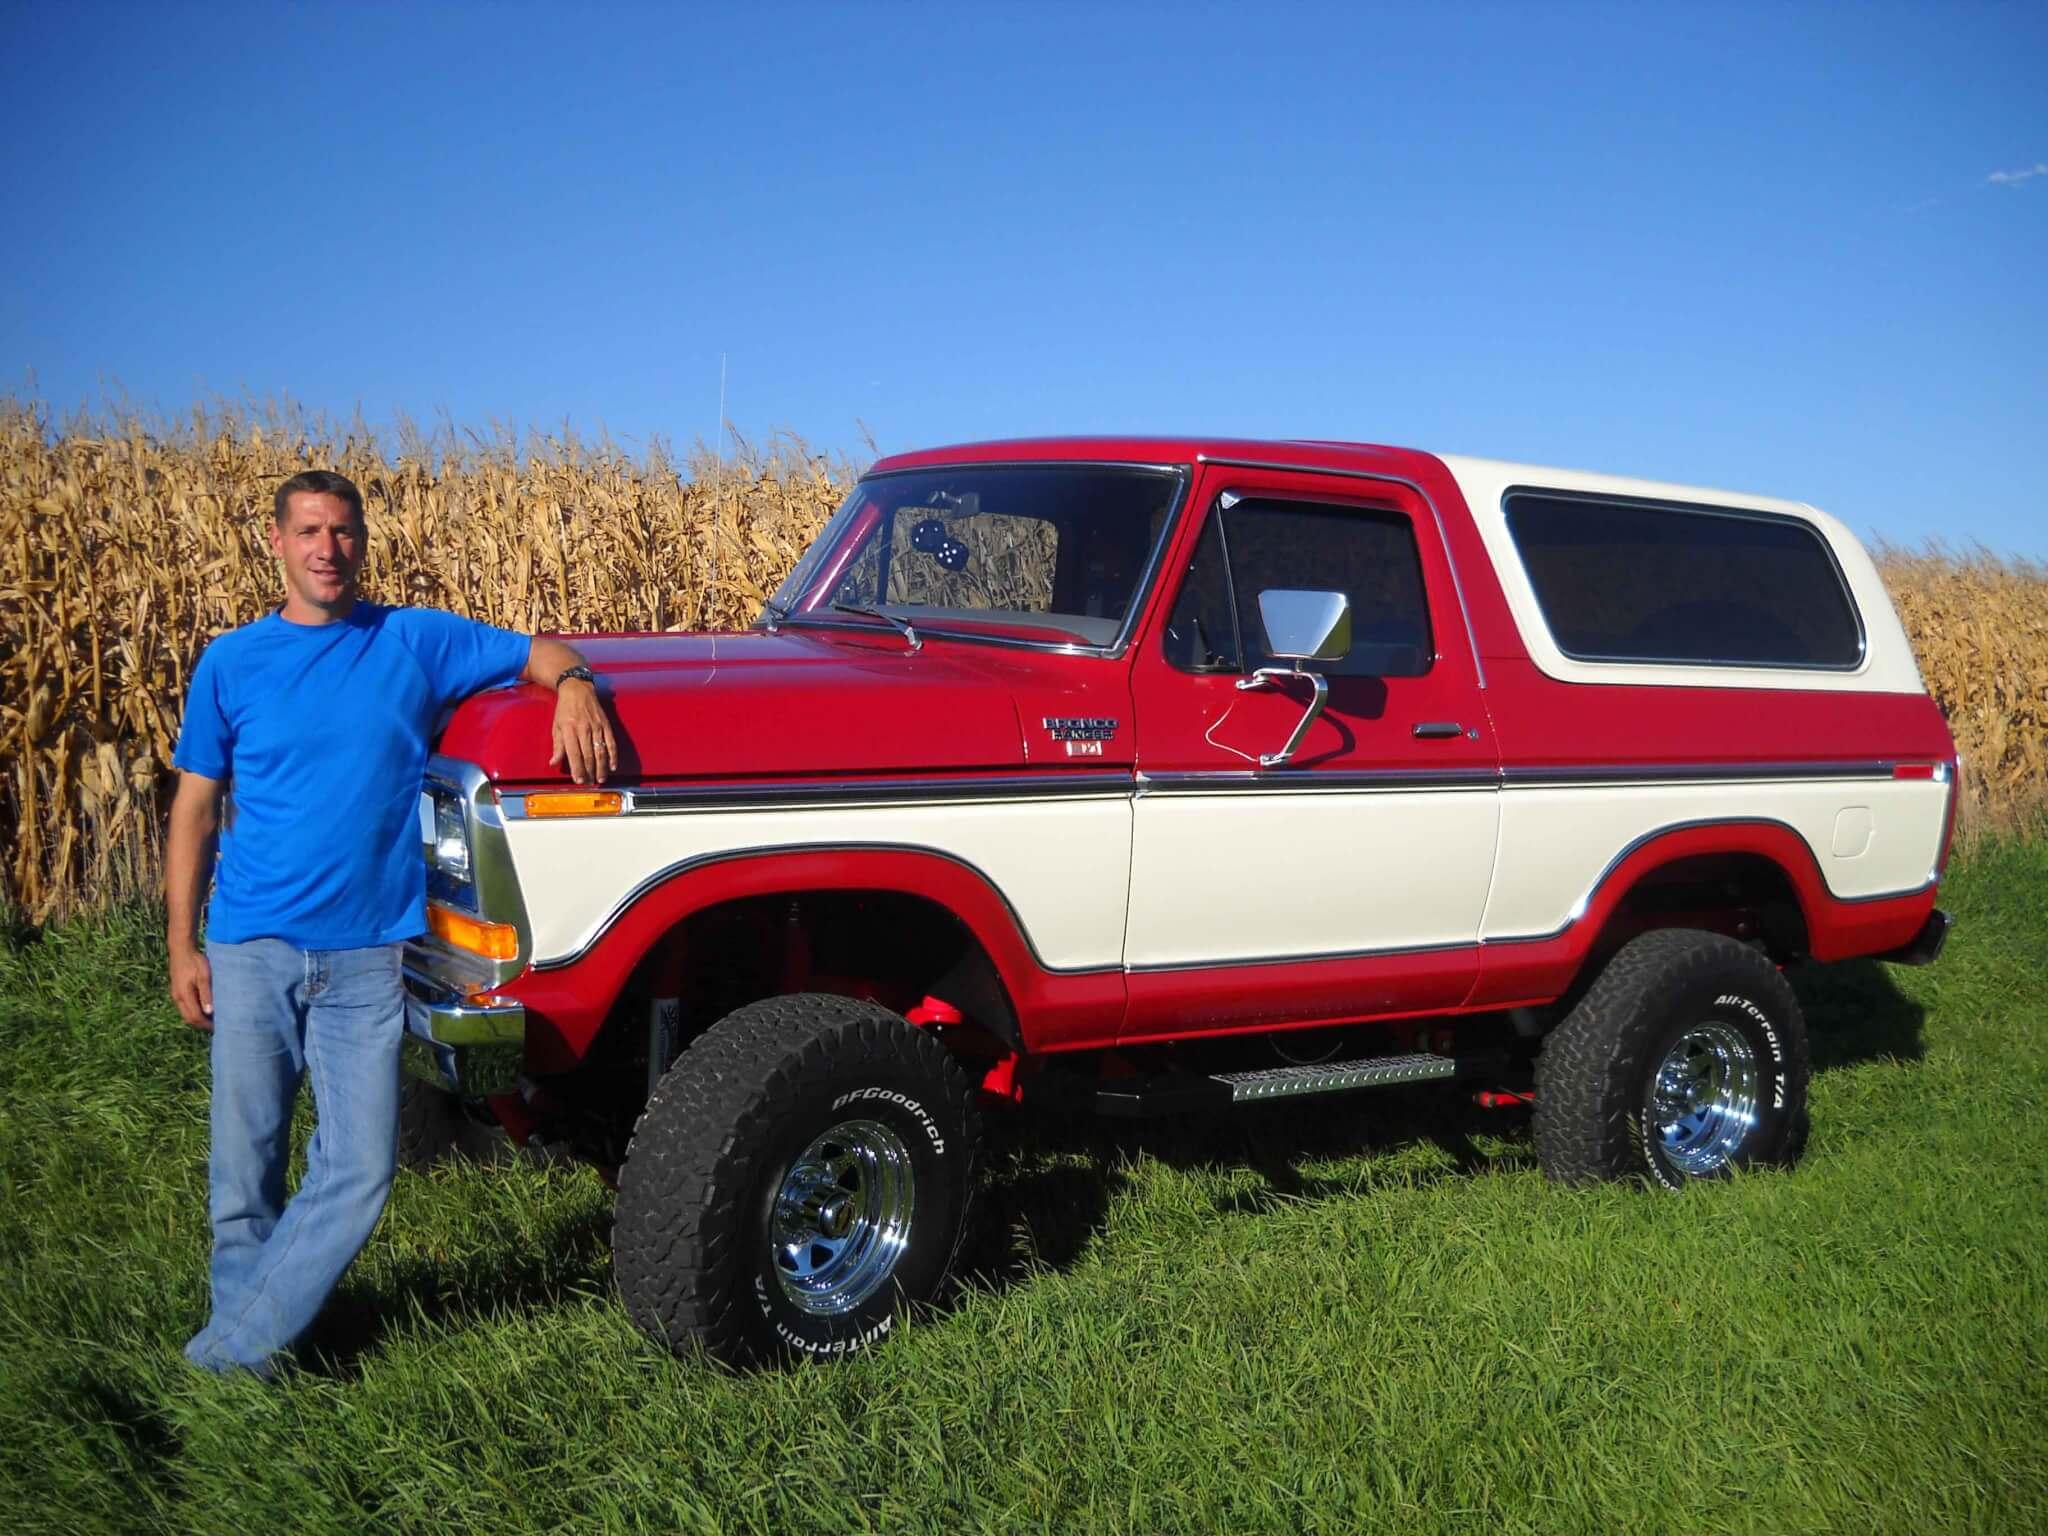 1979 ford bronco - wayne zimny